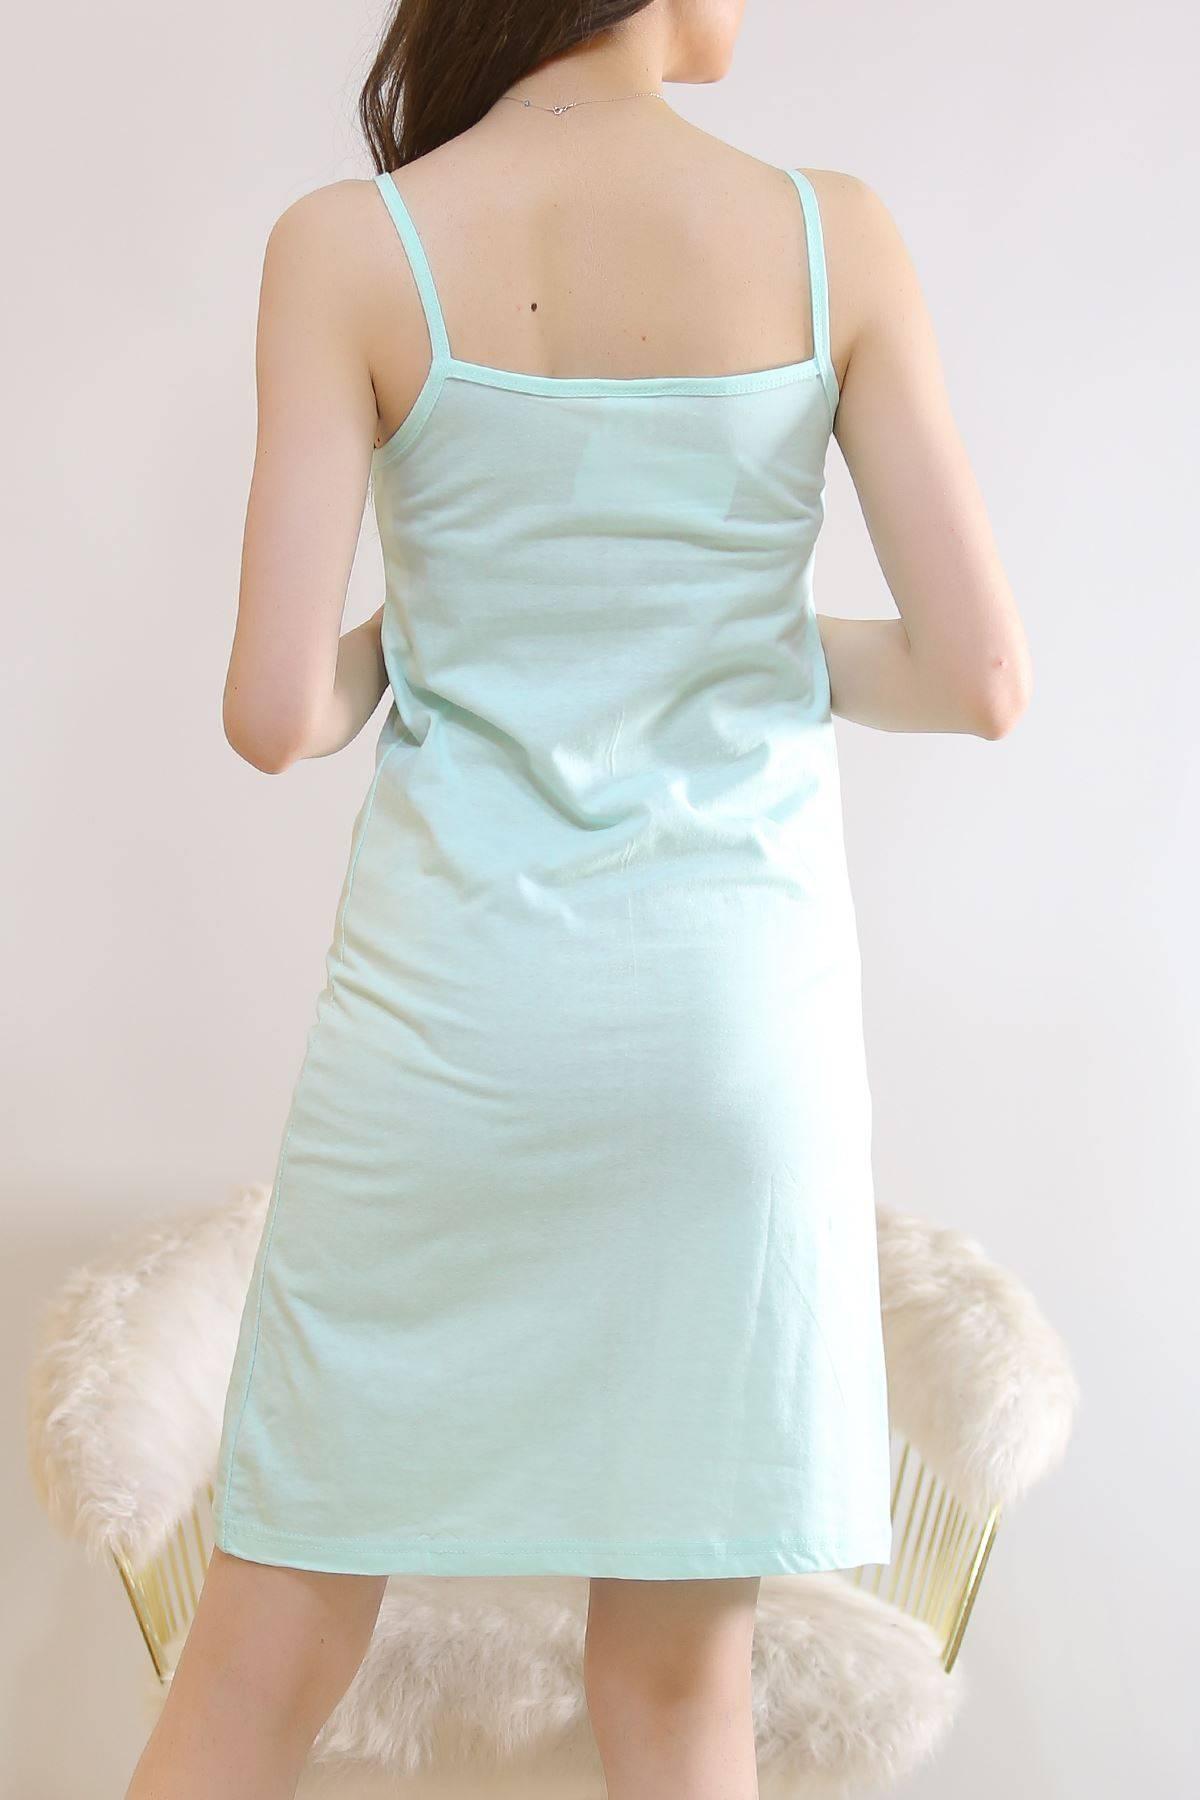 İp Askılı Elbise Mint2 - 5996.1287.